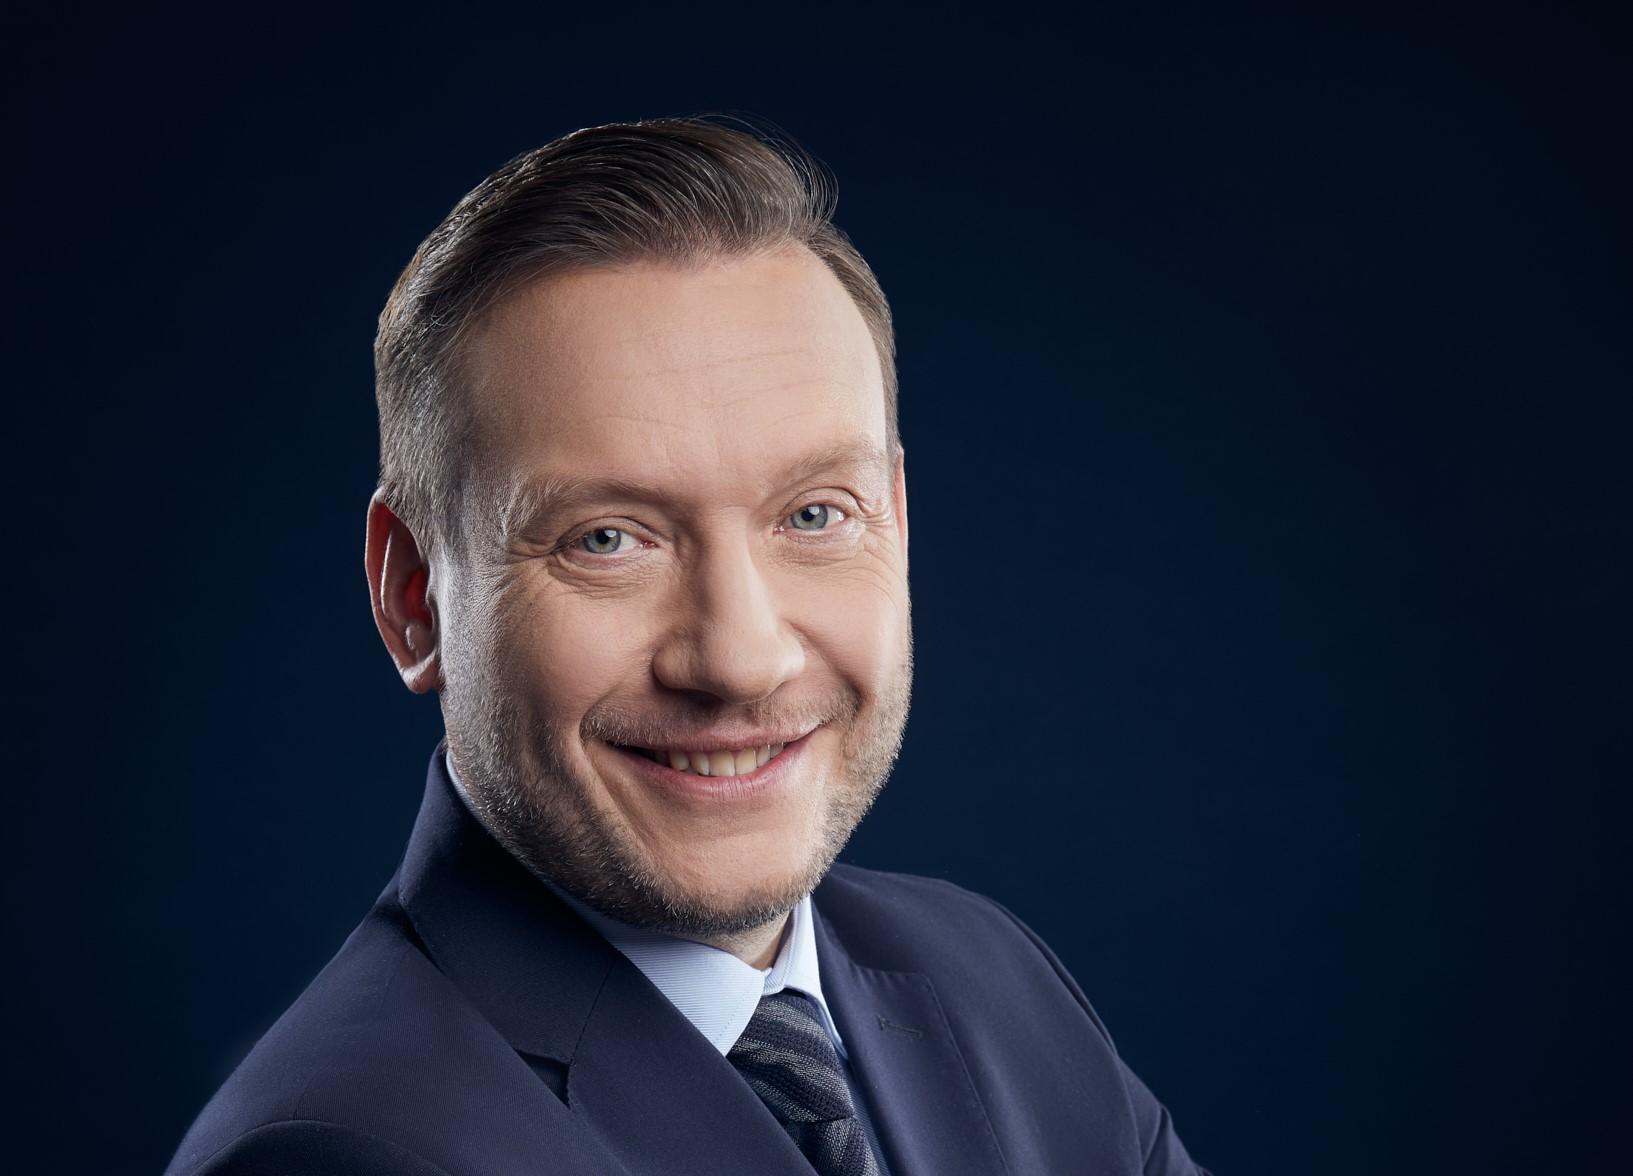 Remigiusz Nowakowski, fot. mat. pras.